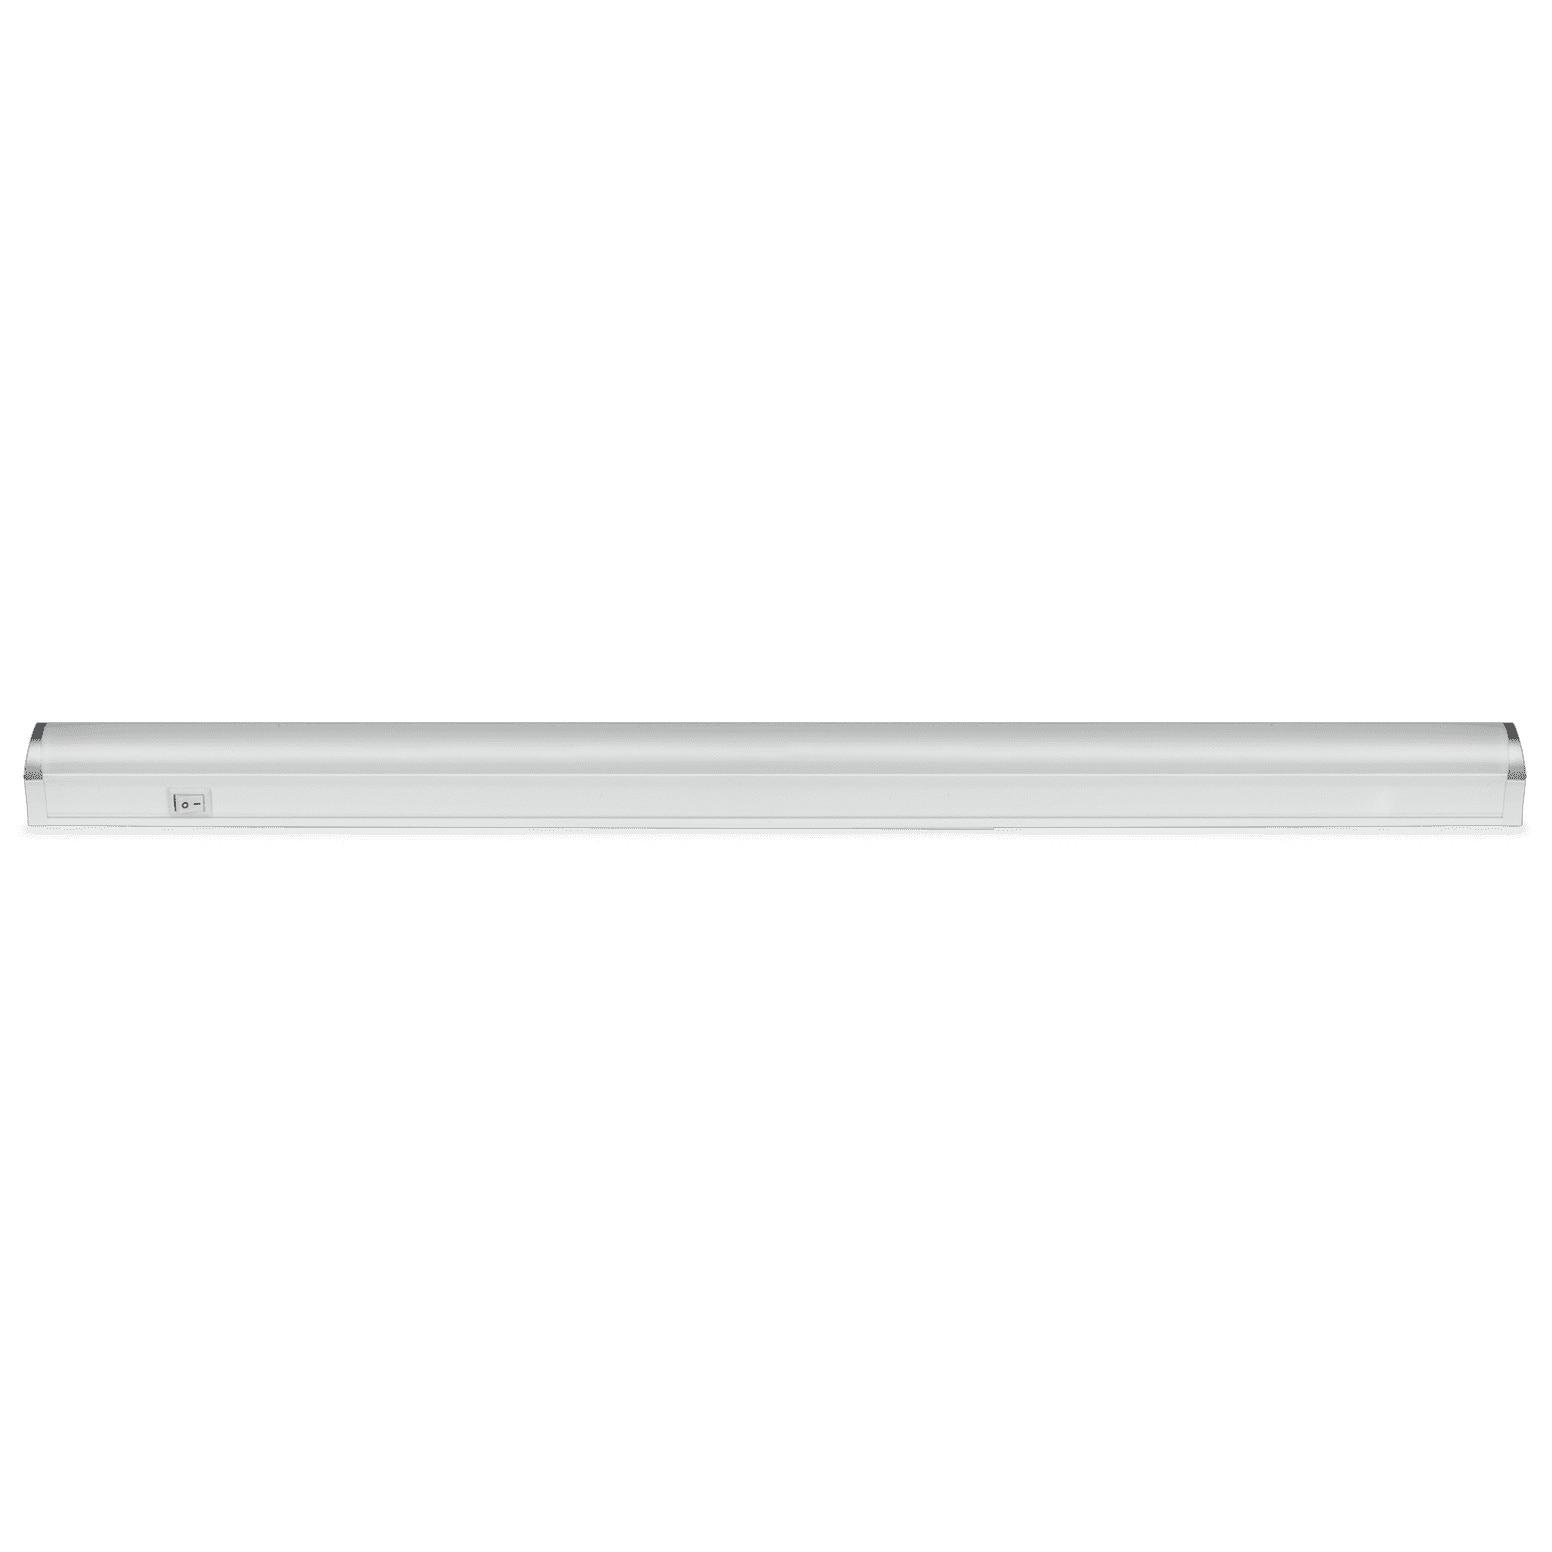 Downlight LED спб-t8-фито 12w 160-260v Ip40 900mm For Plant Growth 4690612006284